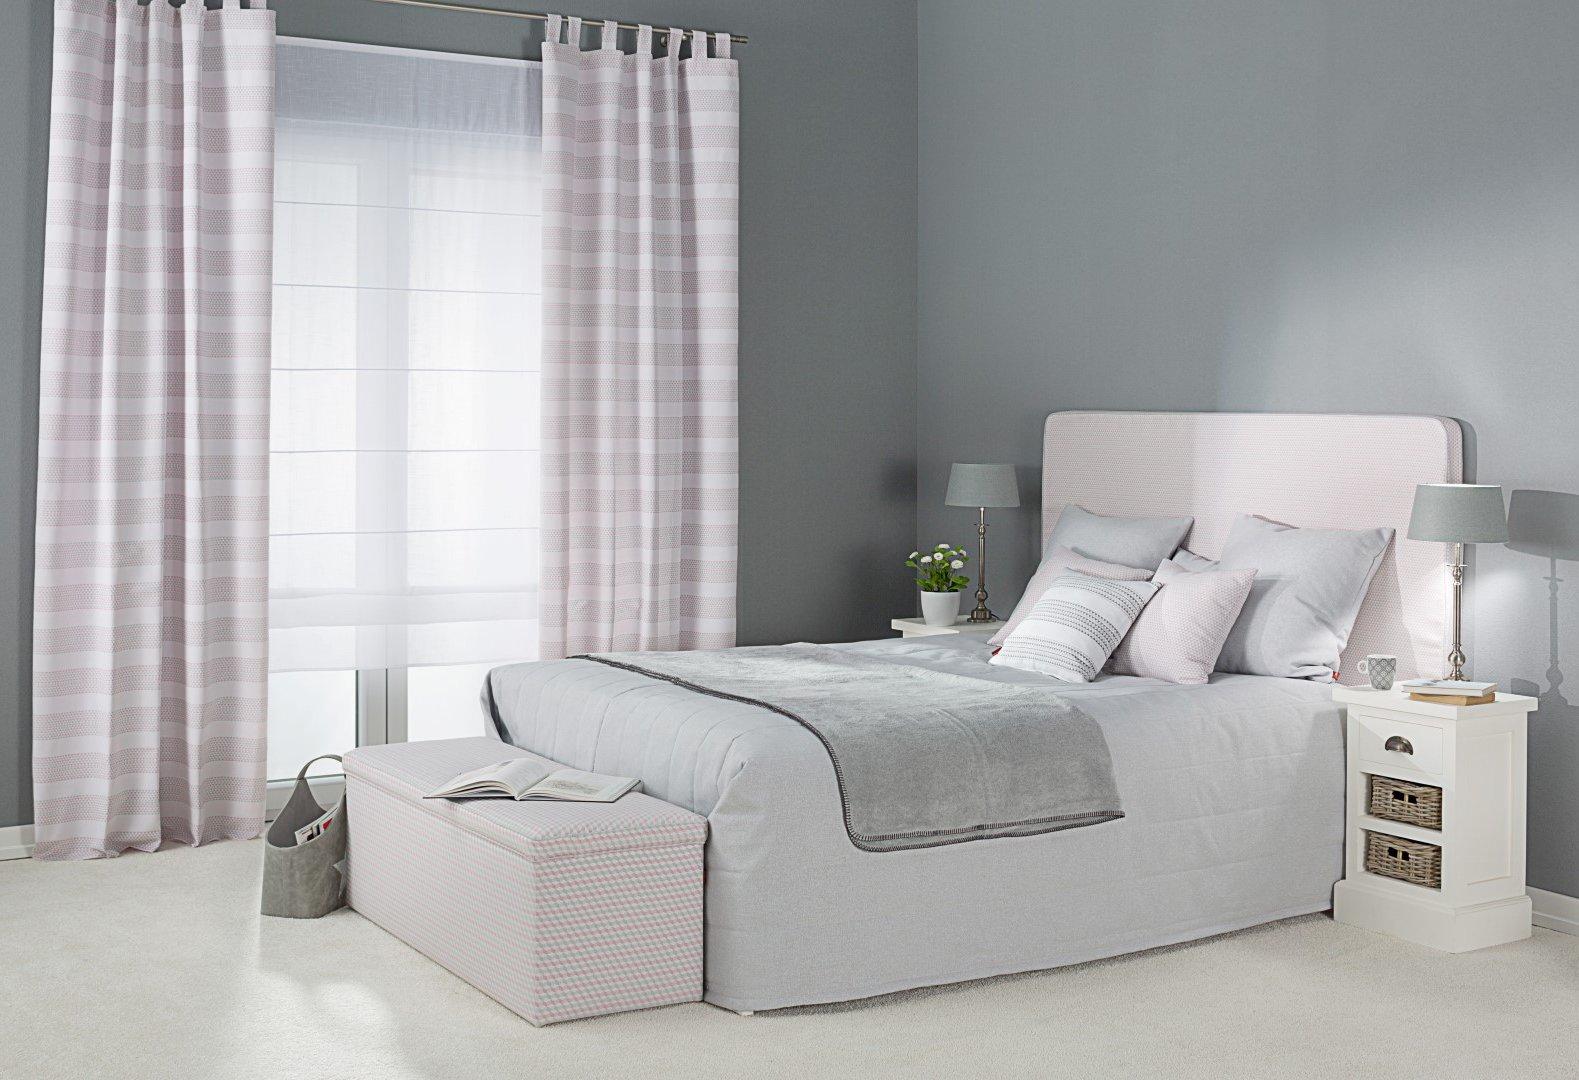 Miegamasis - Rustica